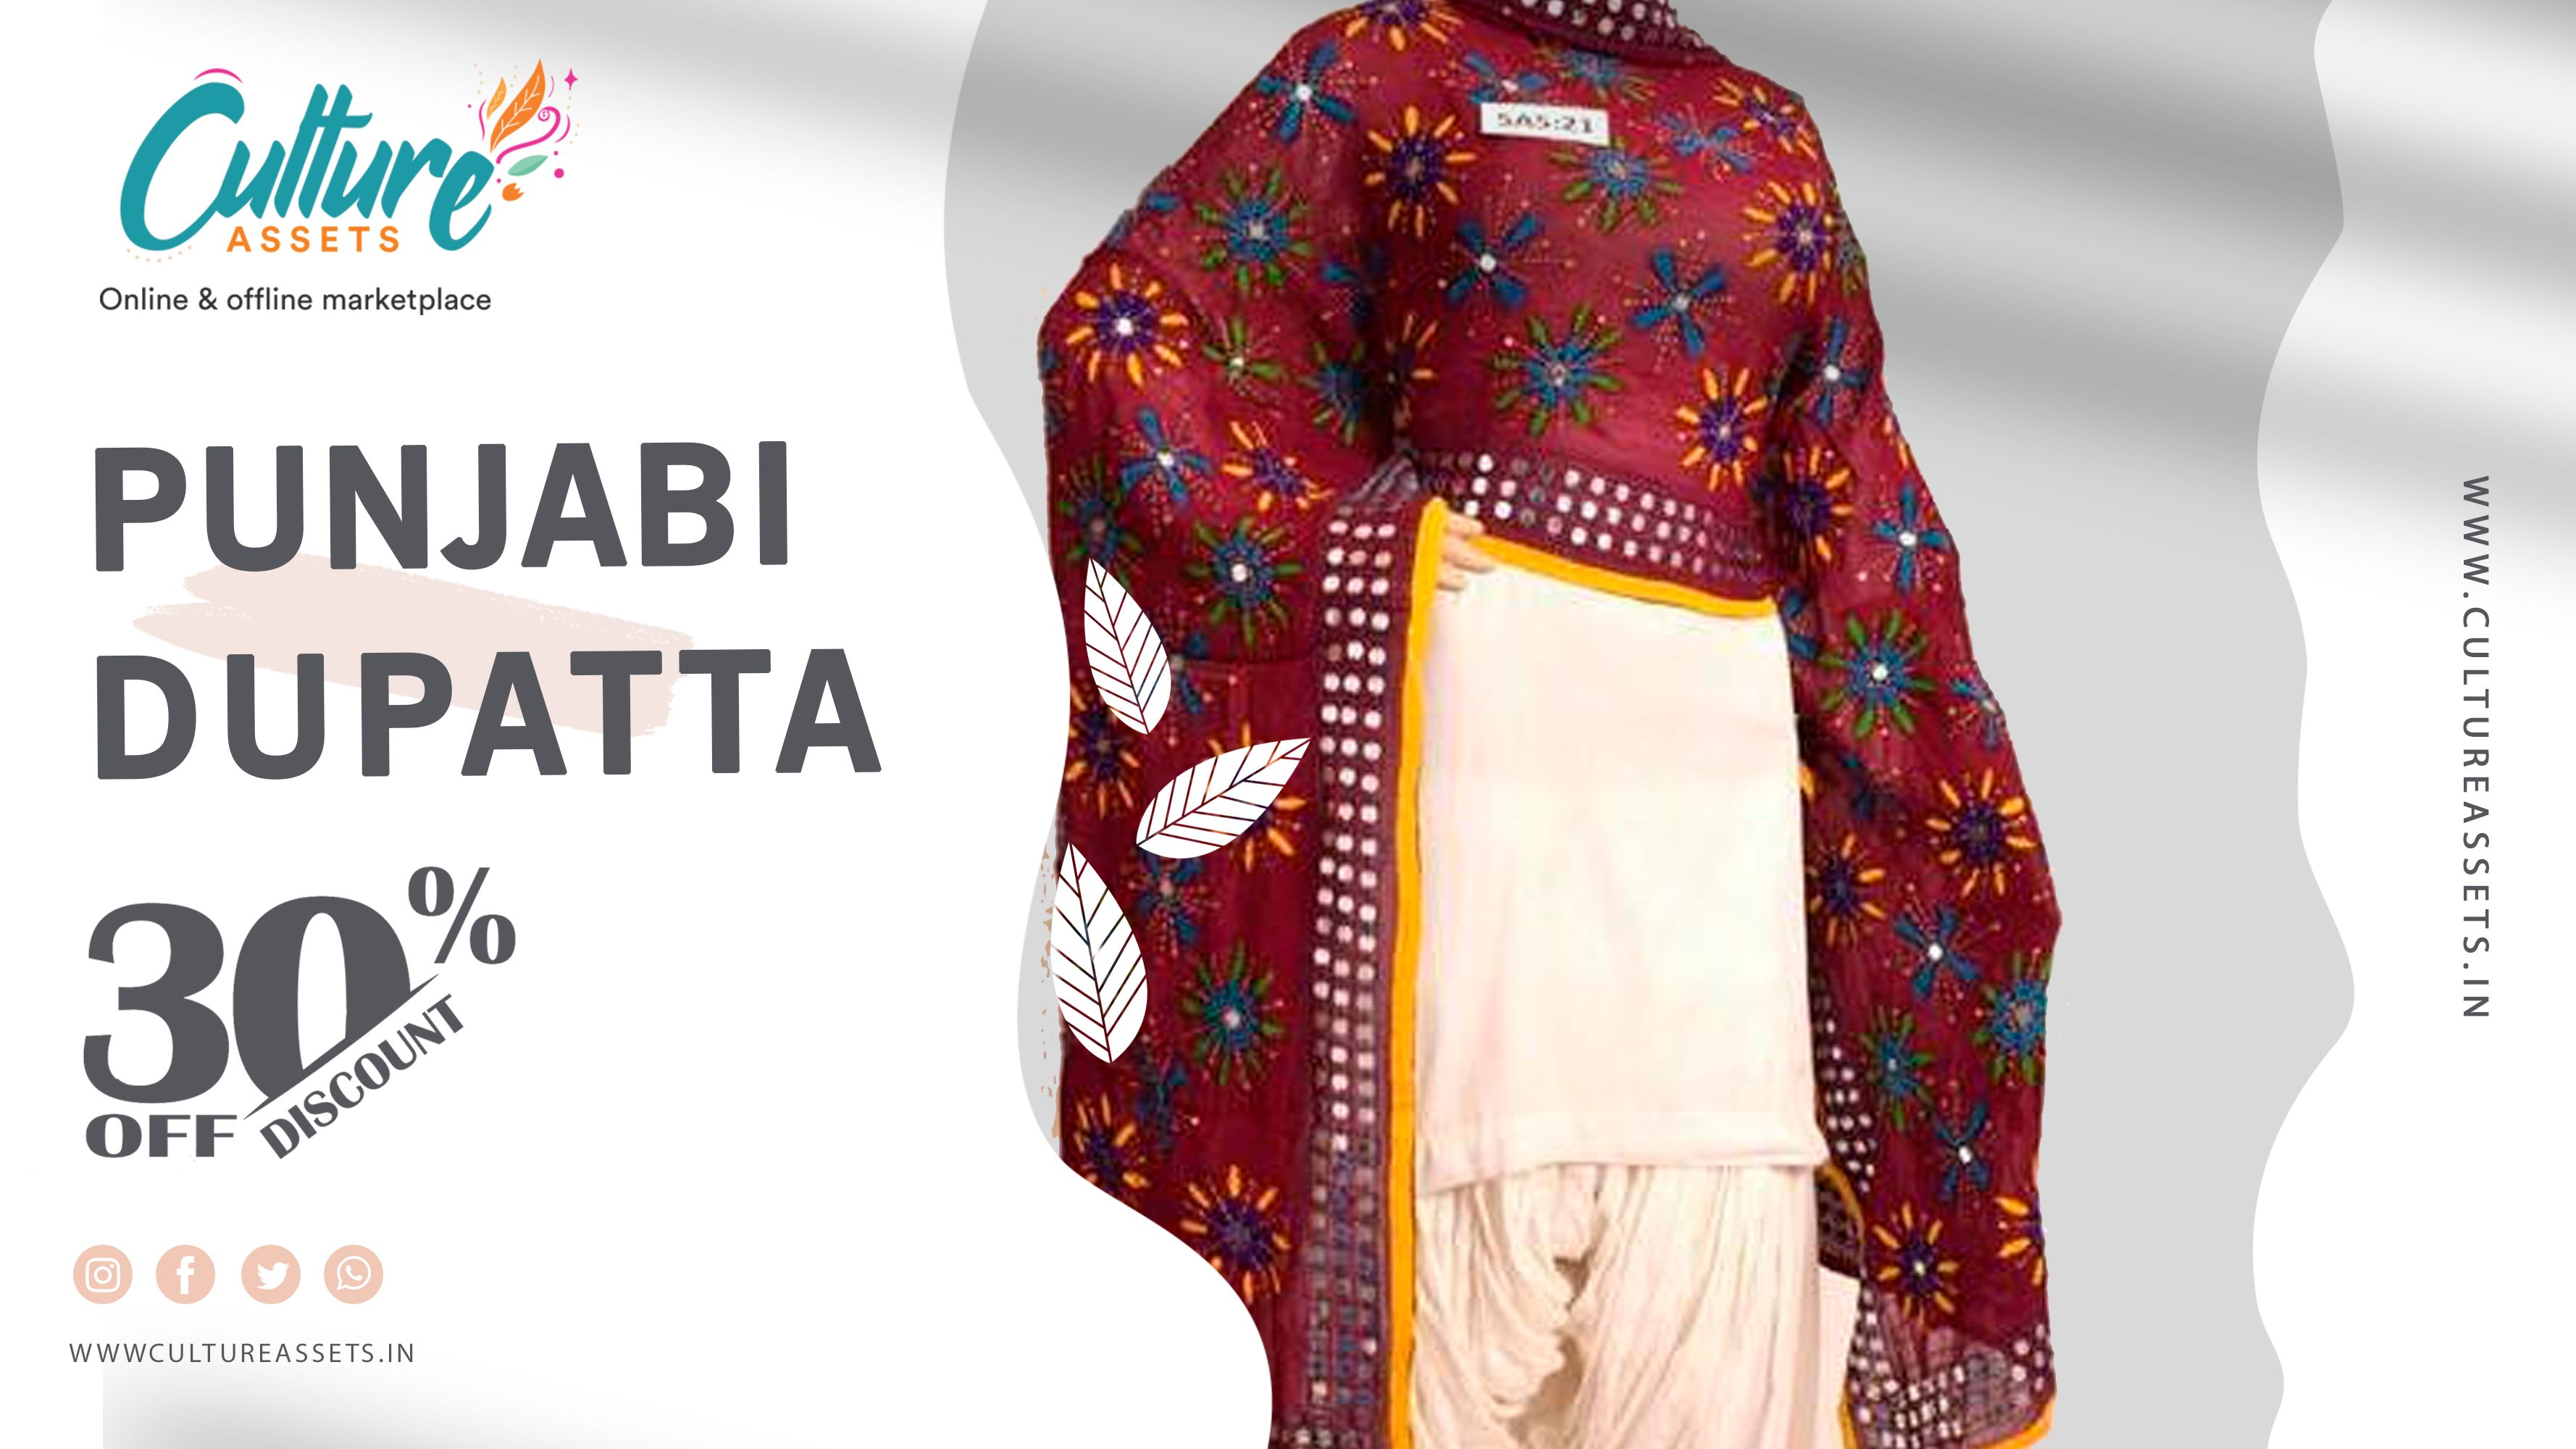 Get Amazing Punjabi Dupattas by Culture Assets!! Coming Soon!! . . . #punjabidupatta #heavydupatta #designerdupatta #fulkaridupatta #dupattaonline #pulkaridupatta #trendydupattas #phulkaridupatta #rajasthani #rajasthan #ajrakhdupatta #velvetdupatta #bridaldupatta #fancydupattas #dupattalover #floraldupatta #cottondupatta #punjabisuits #bandhanidupatta #embroidereddupatta #fancydupatta #lifestylish #indianinspired #indianwearforwomen #decorativeborder #punjab